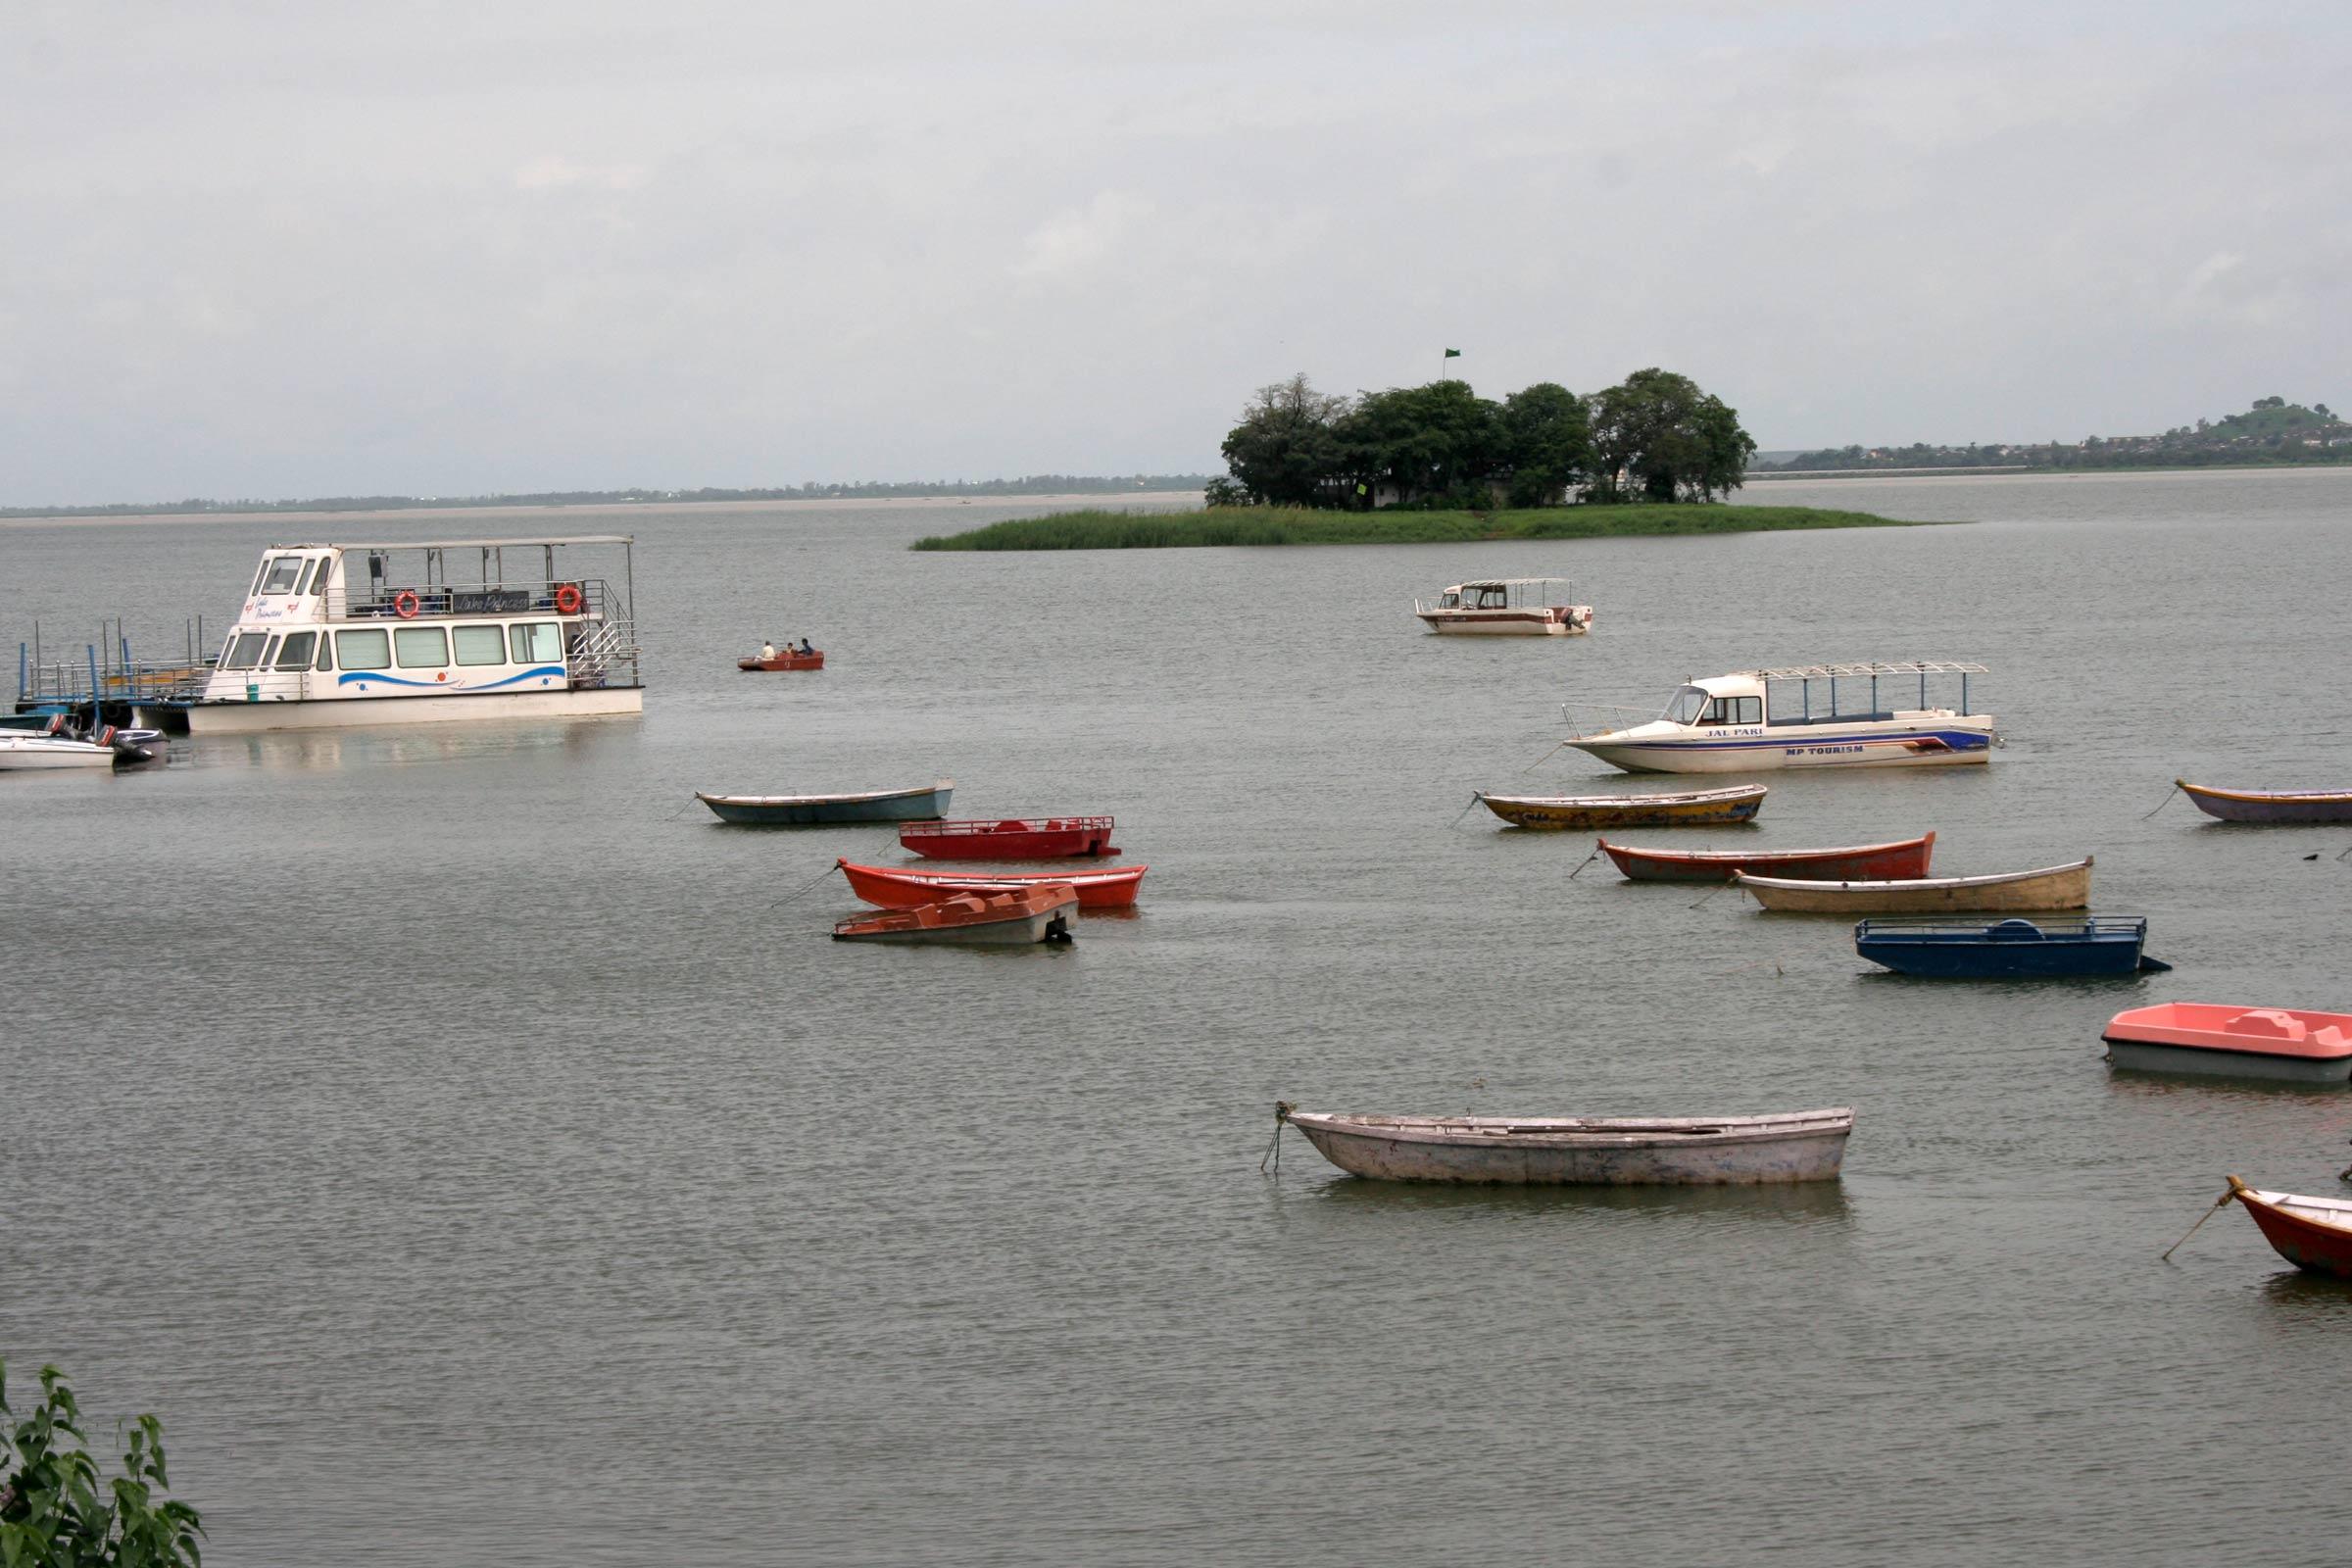 Shah Ali Dargah Lake